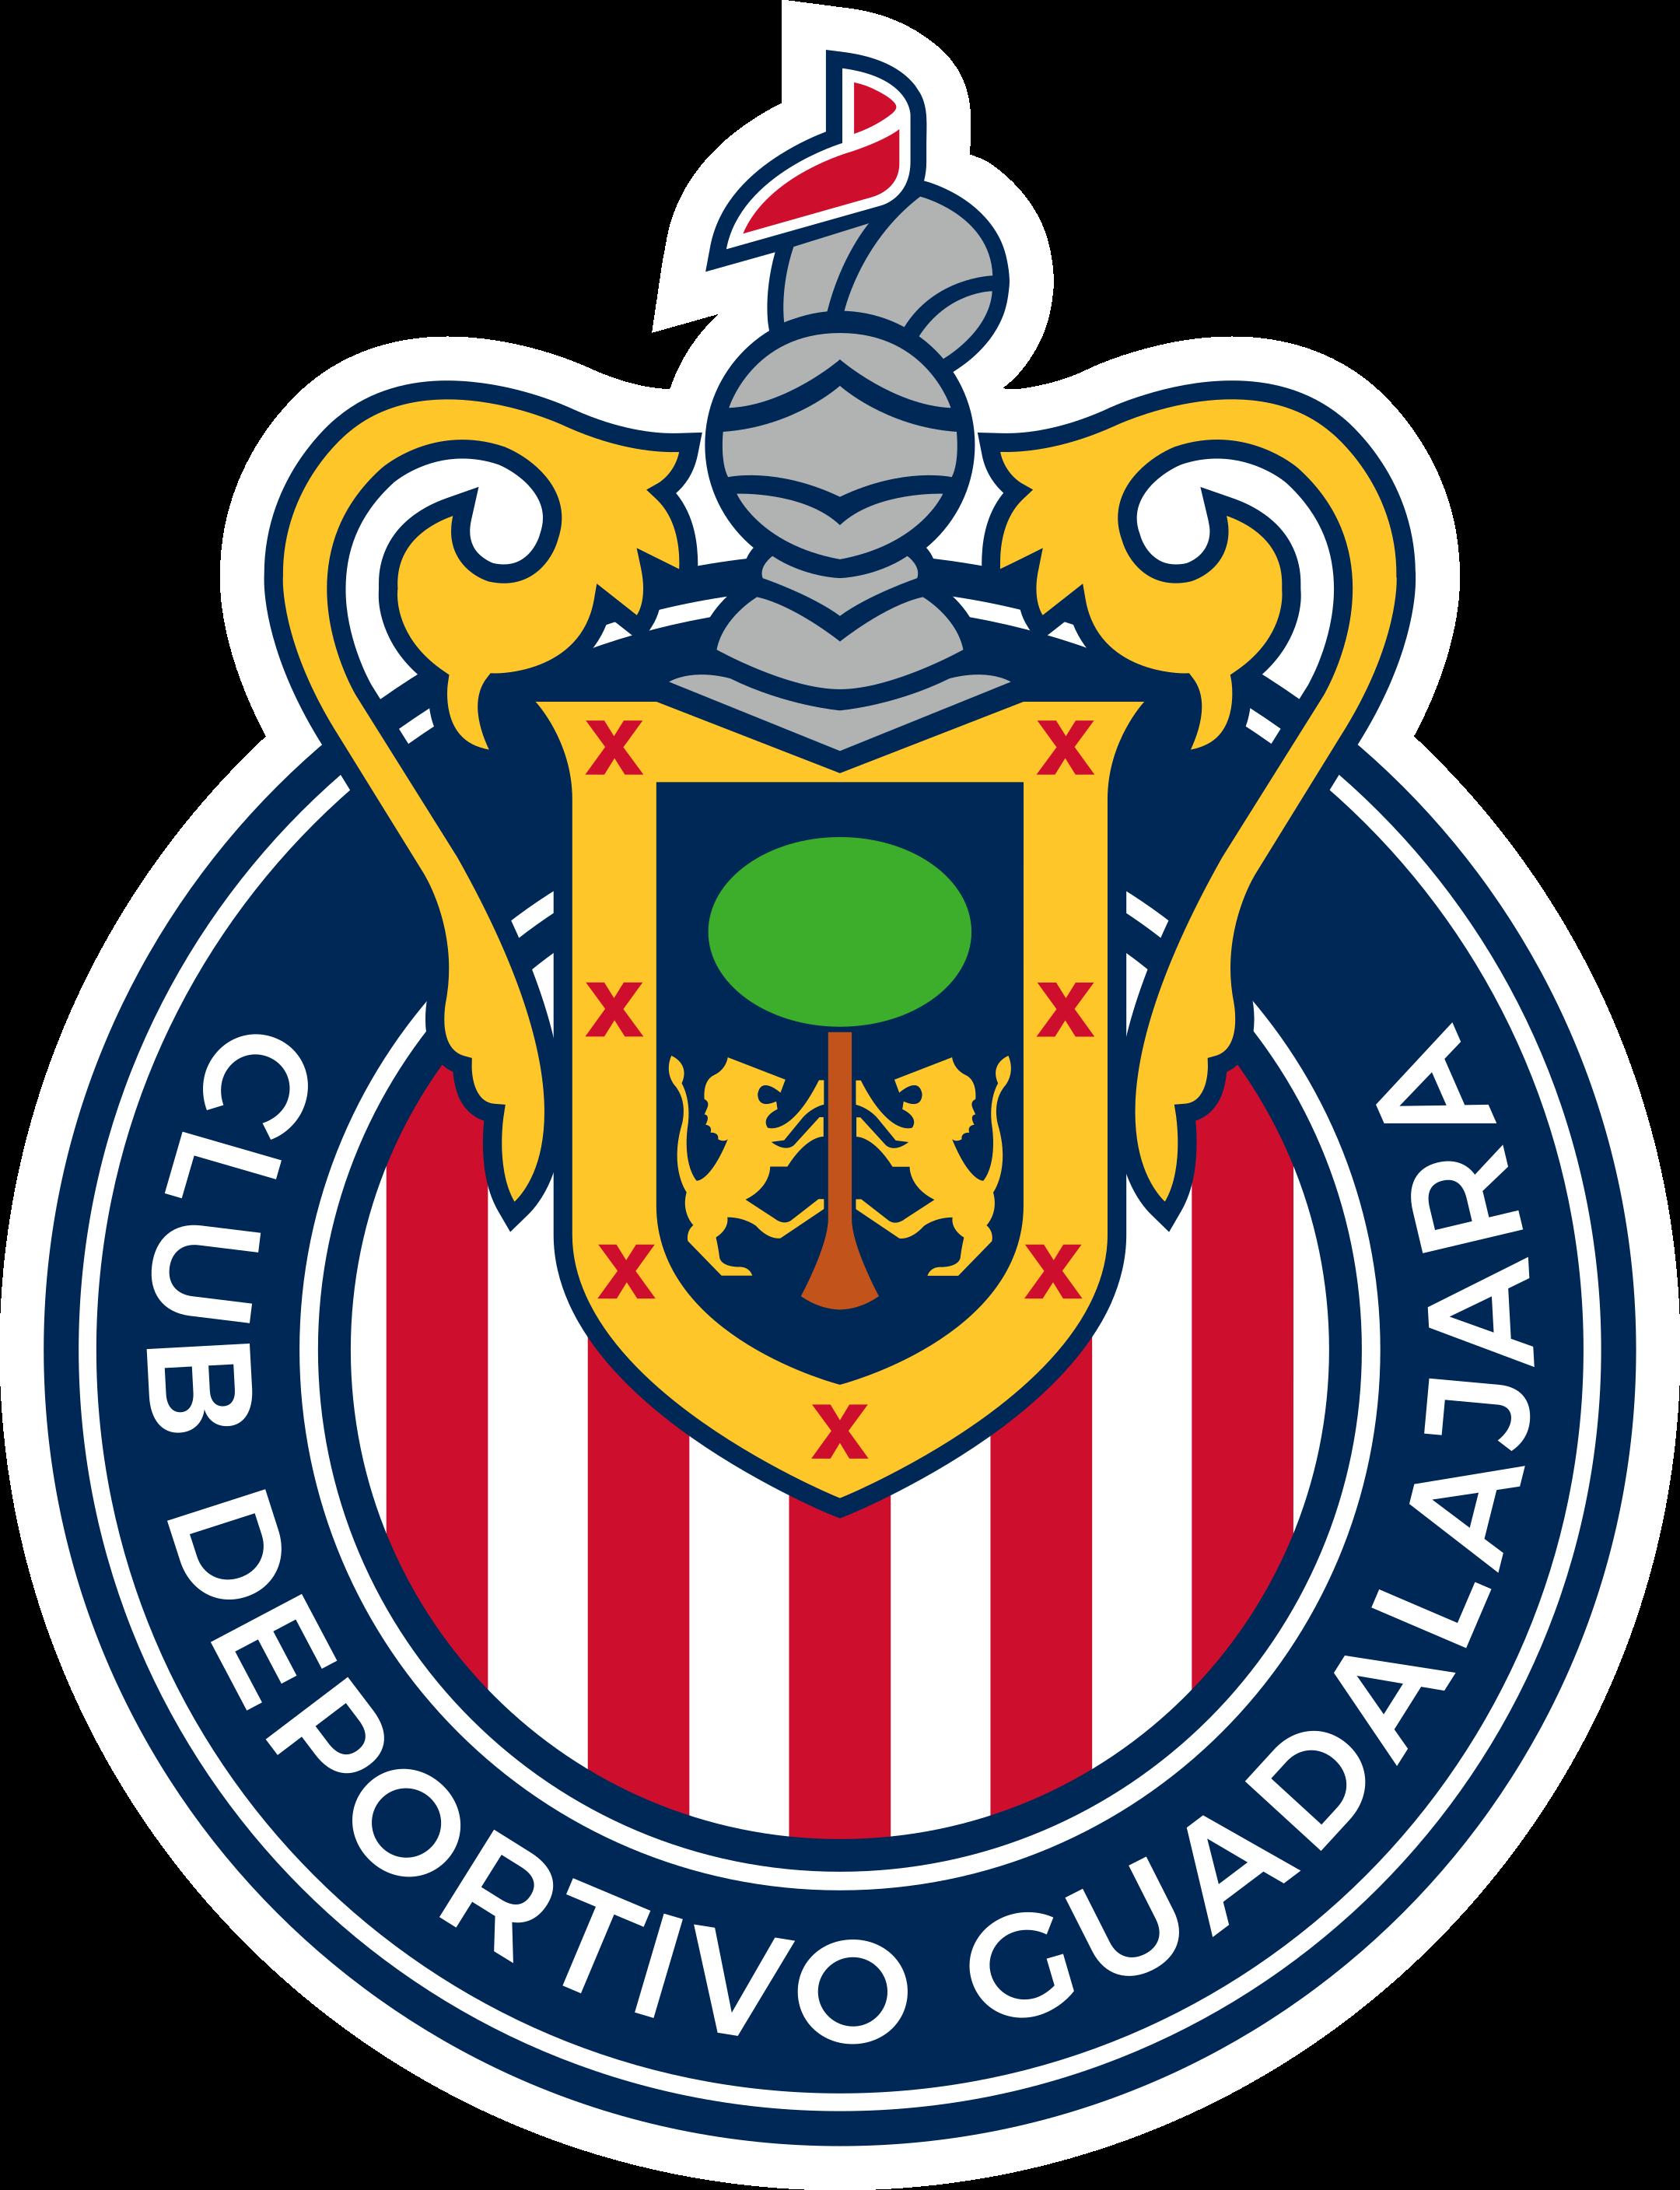 chivas guadalajara logo 1 - Chivas Guadalajara Logo - Escudo